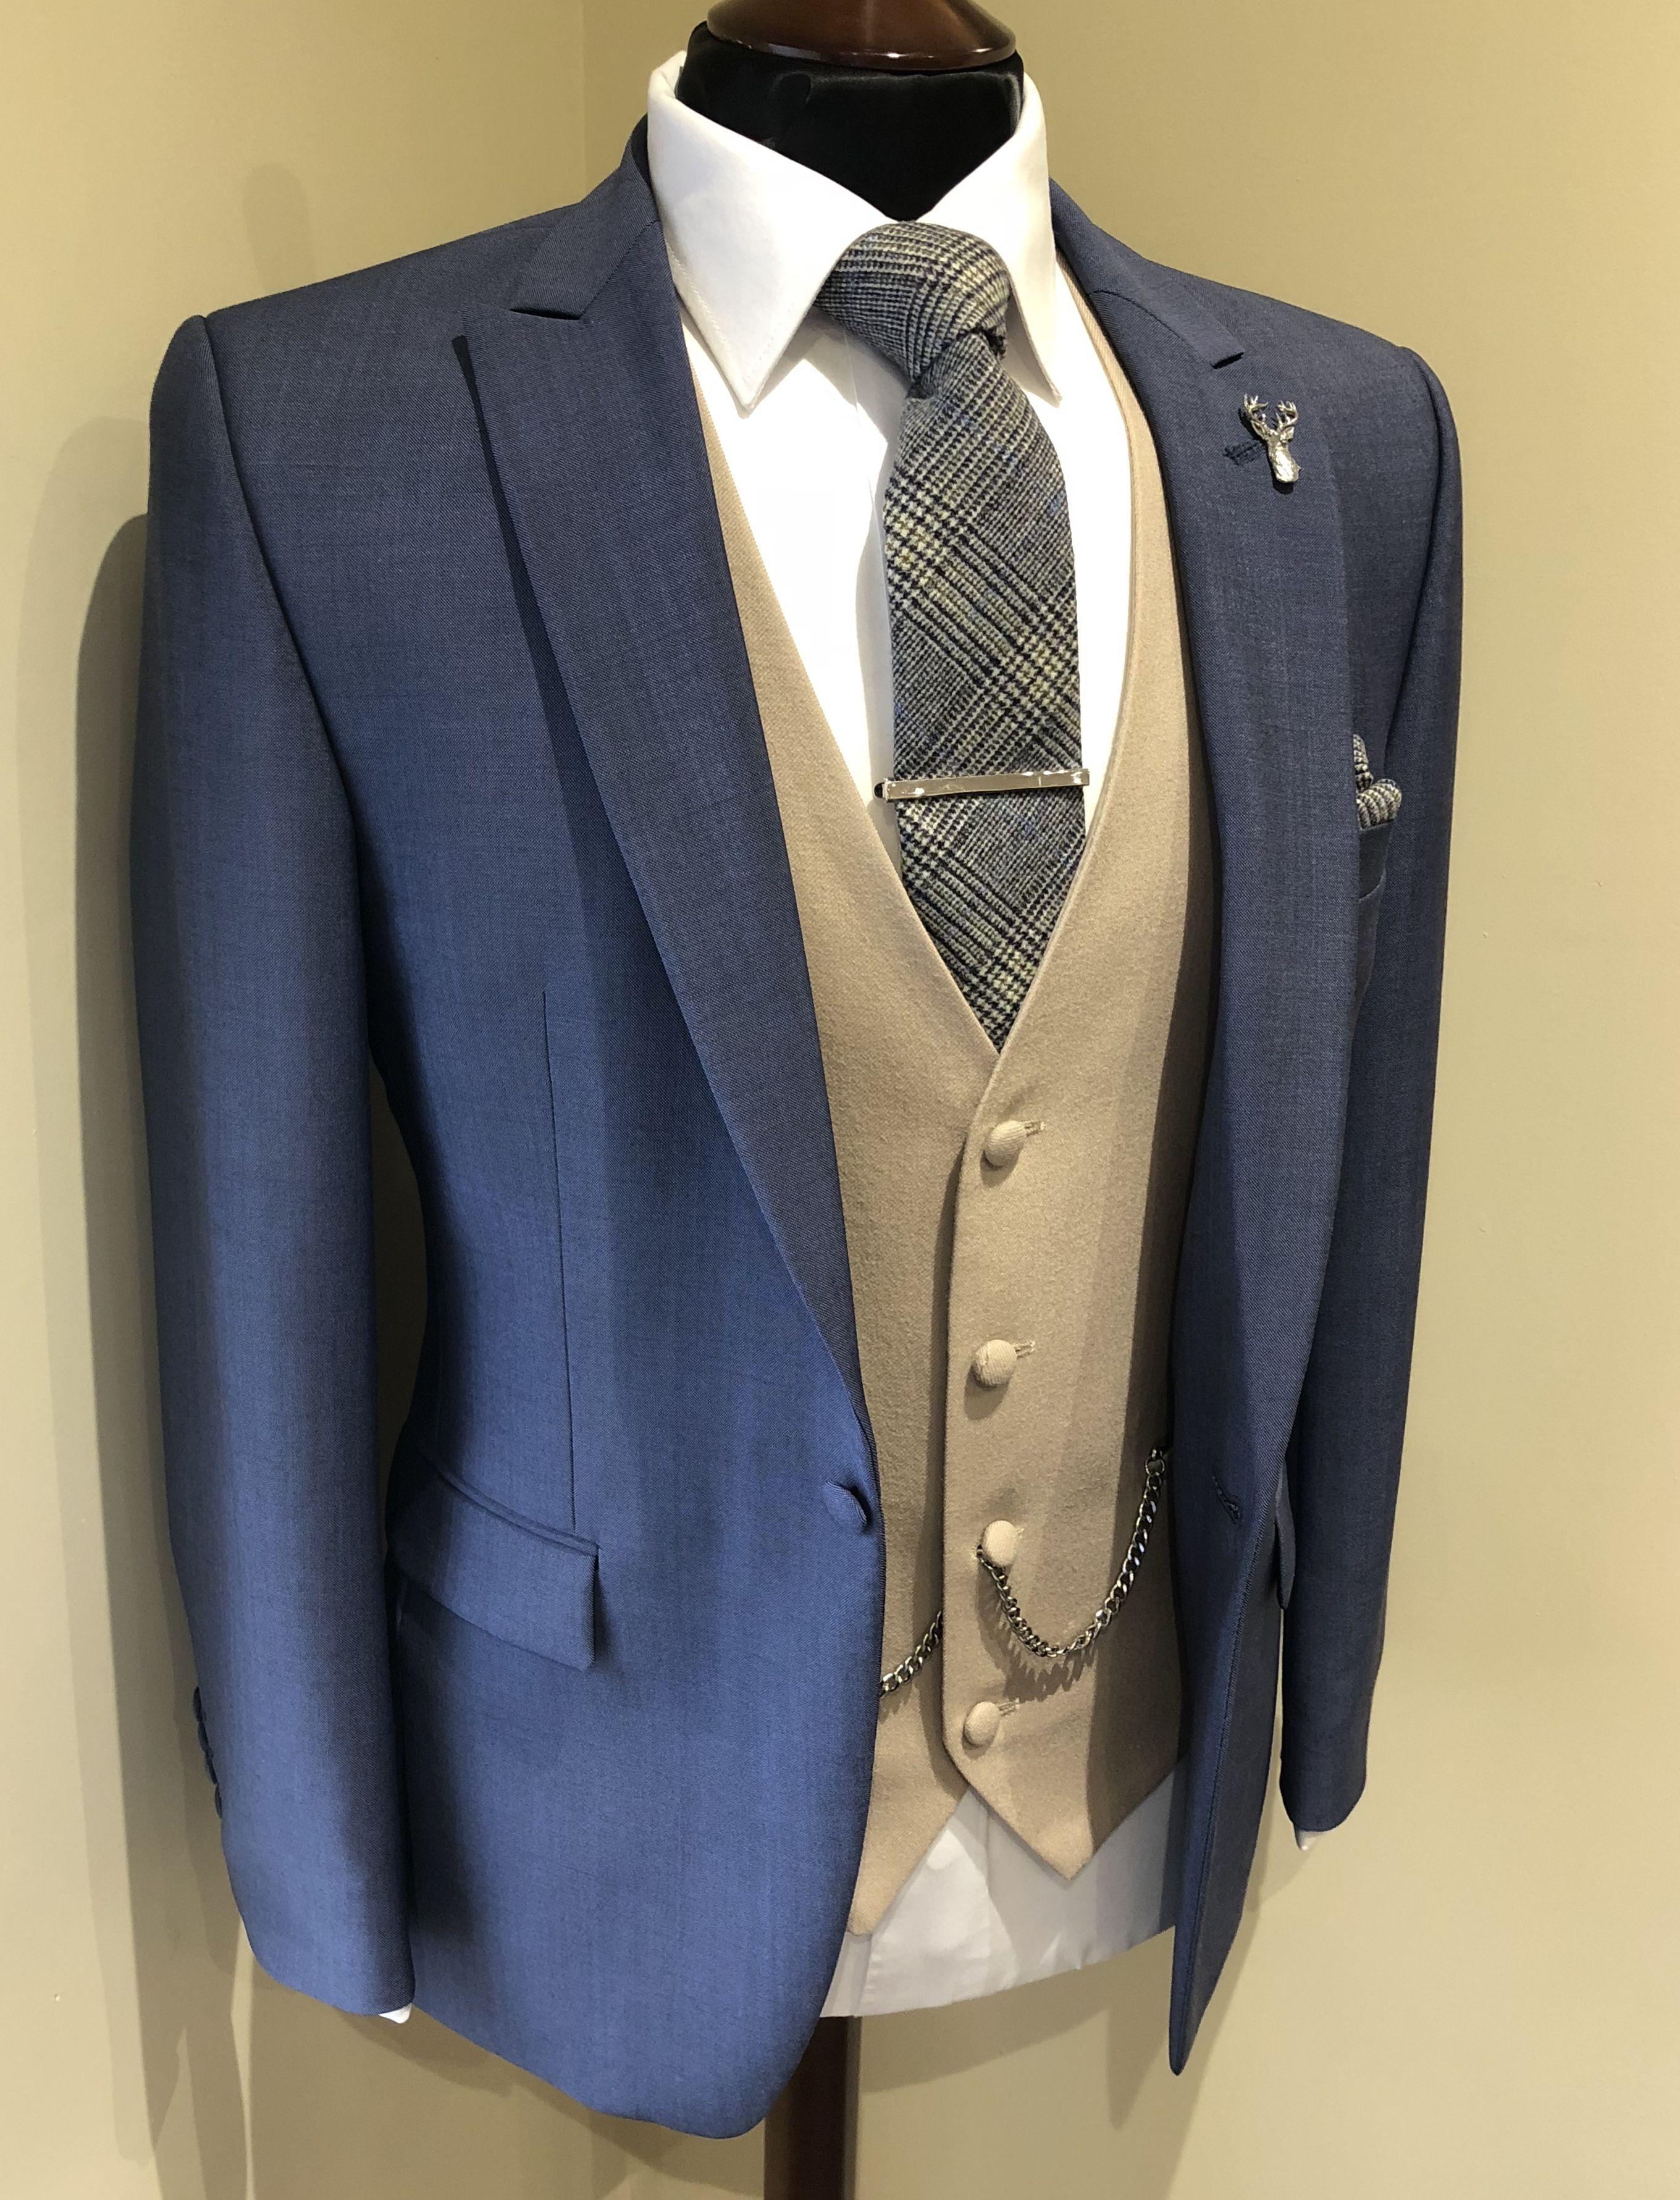 Slim fit airforce blue lounge suit buff/beige waistcoat